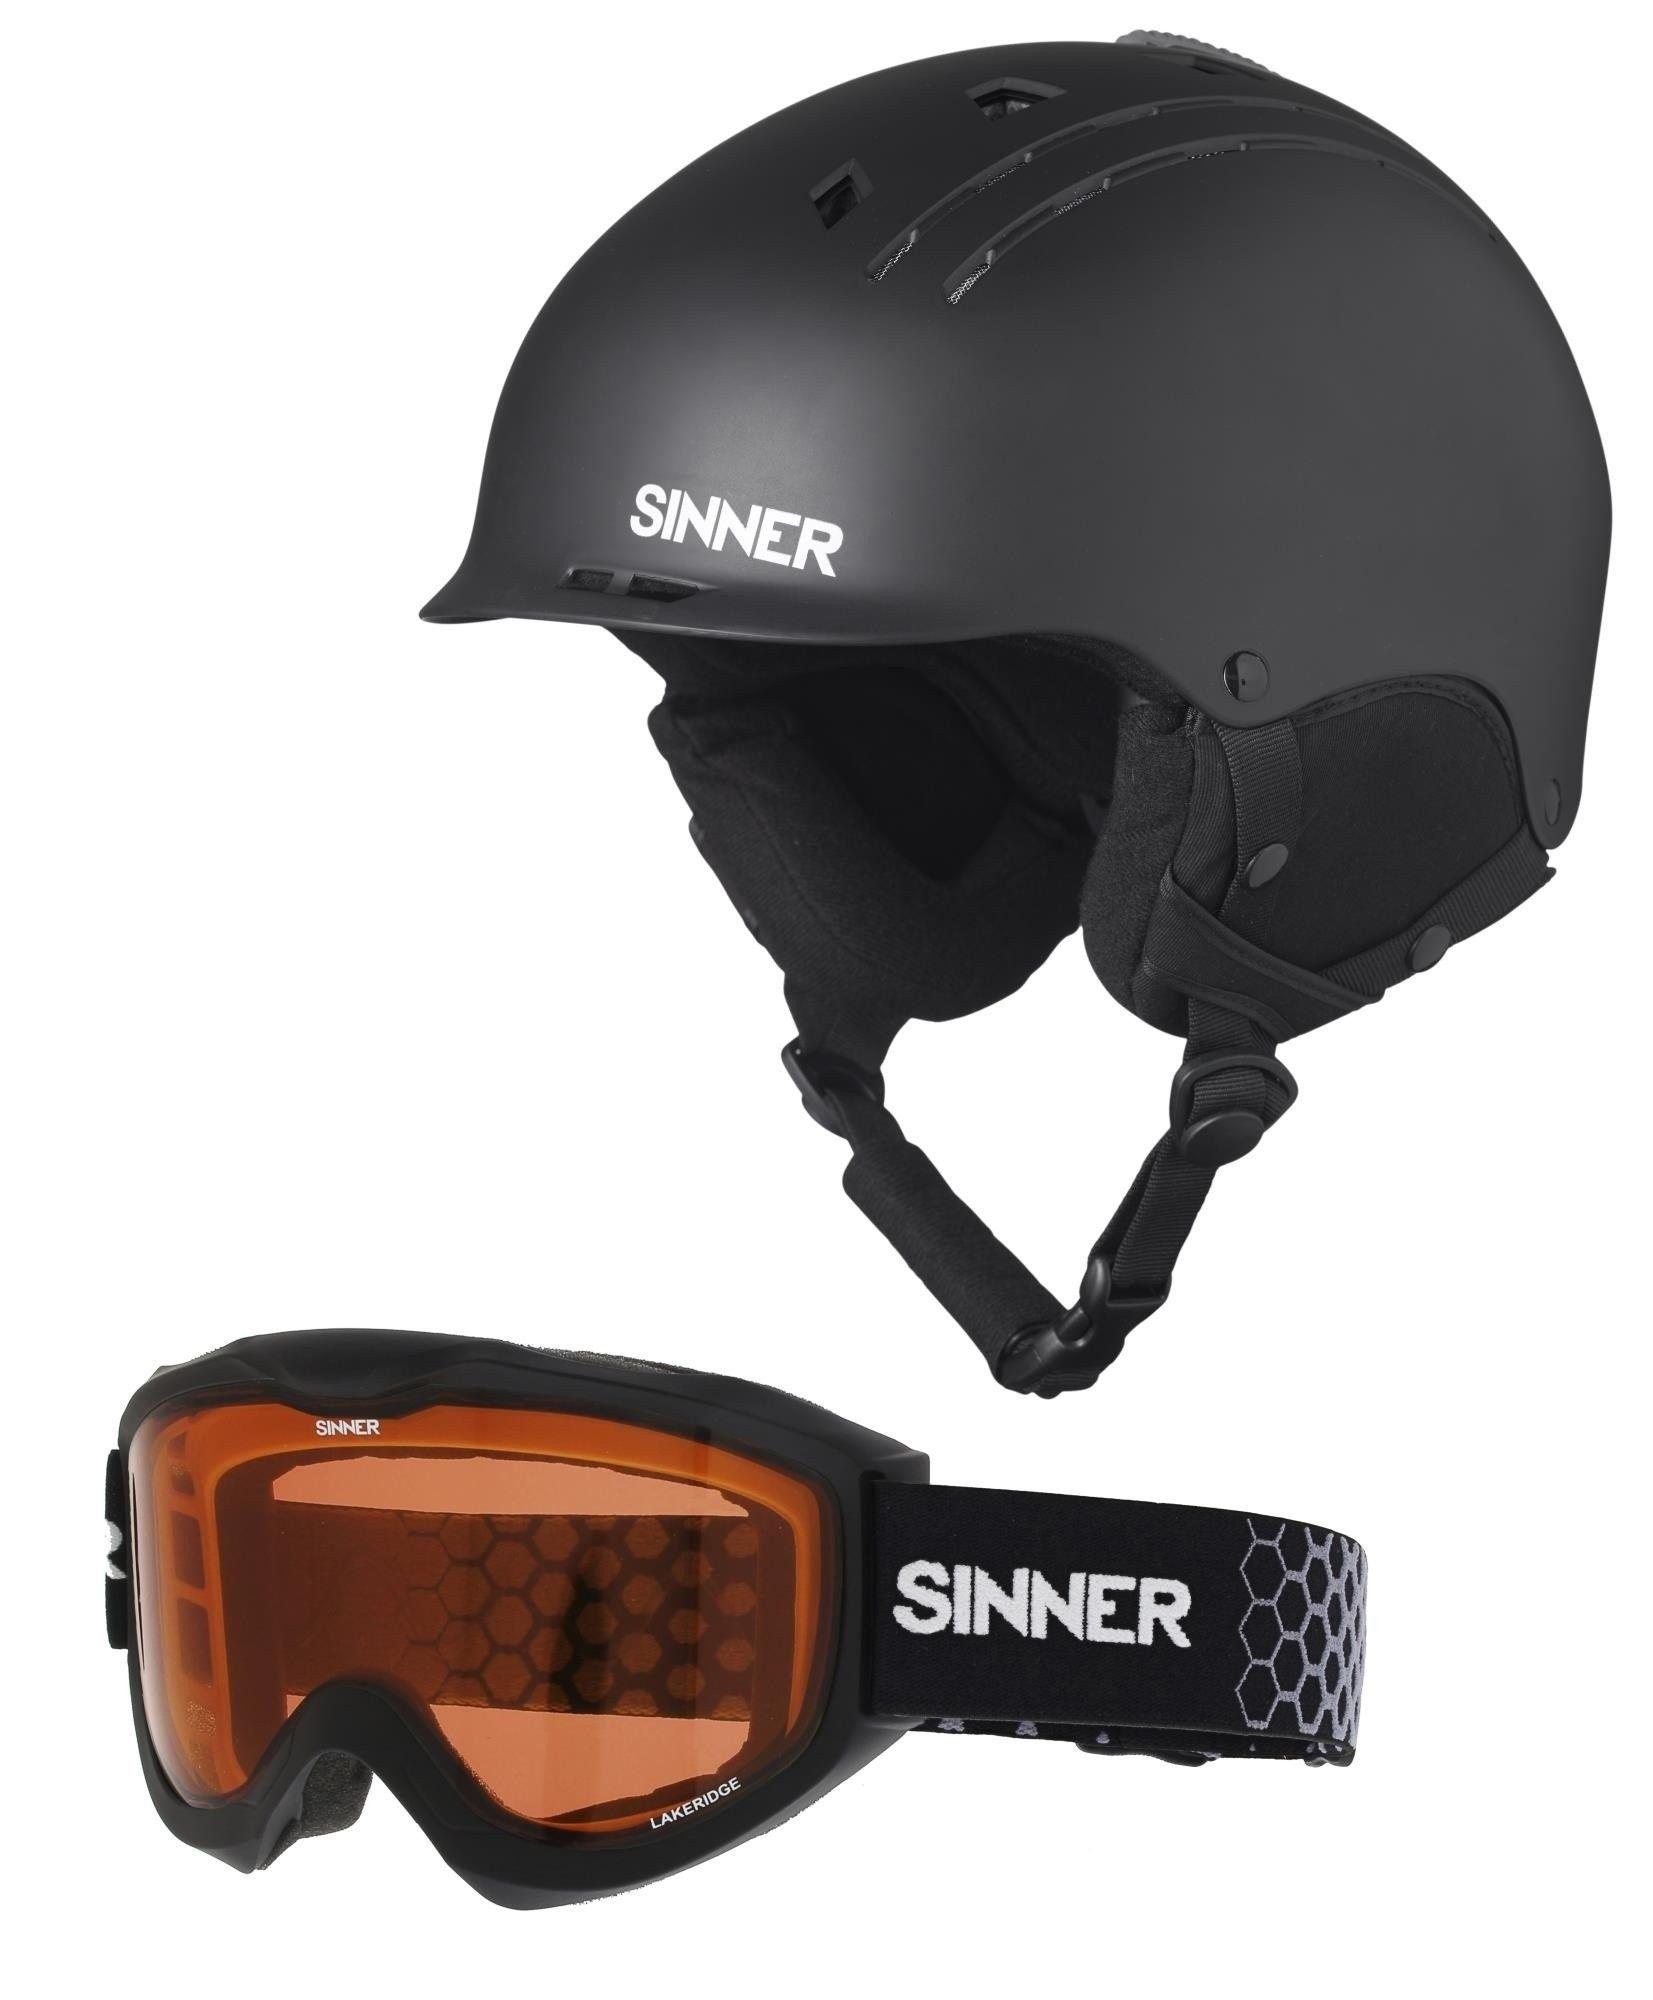 Skihelm + skibril combi pack